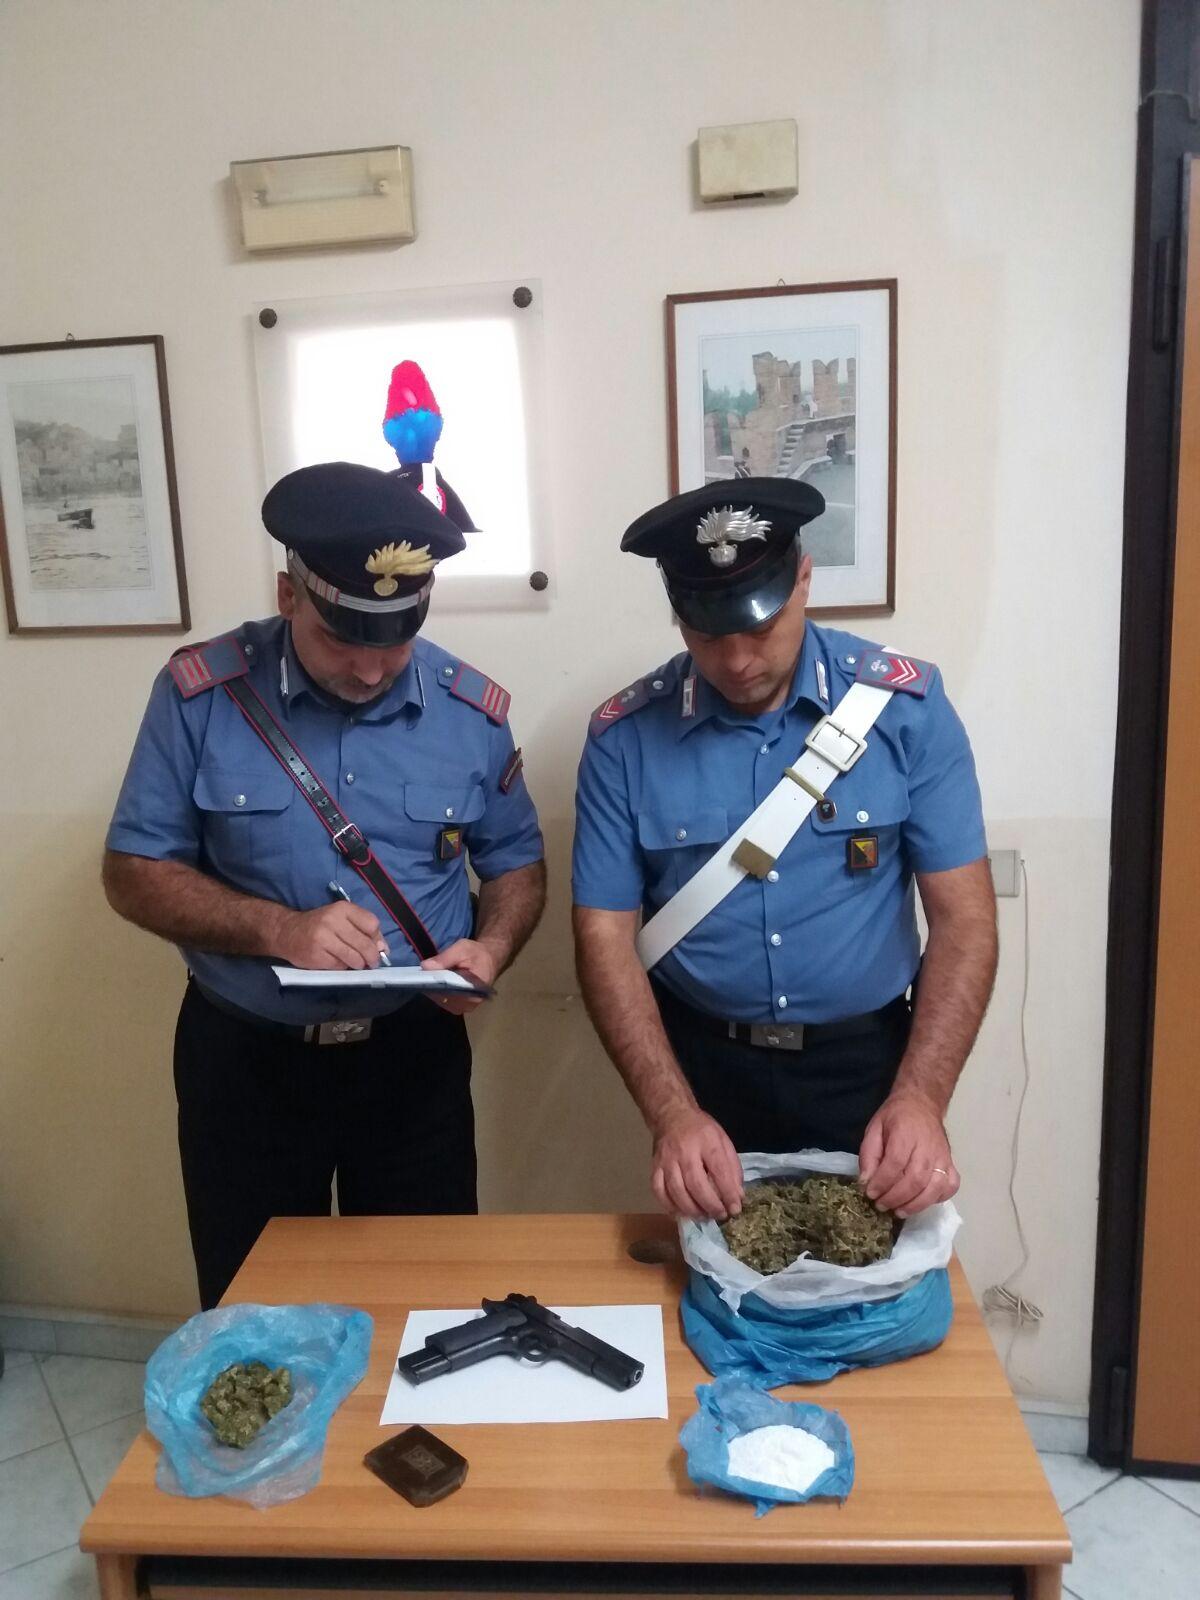 foto-priolo-carabinieri-siracusa-times